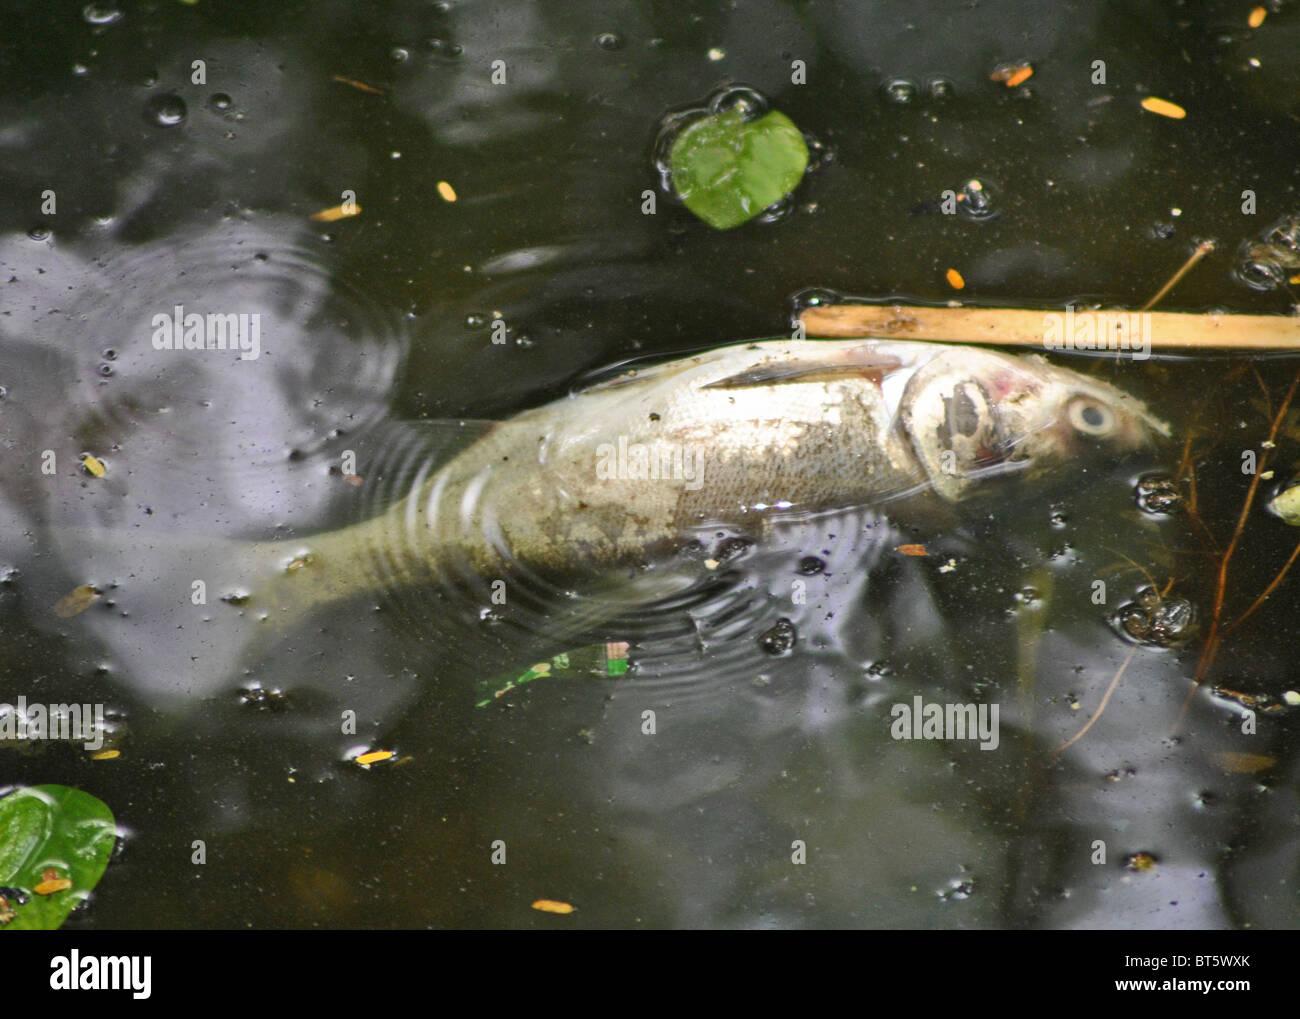 Dead fish in the polluted Hoan Kiem lake in Hanoi, Vietnam - Stock Image